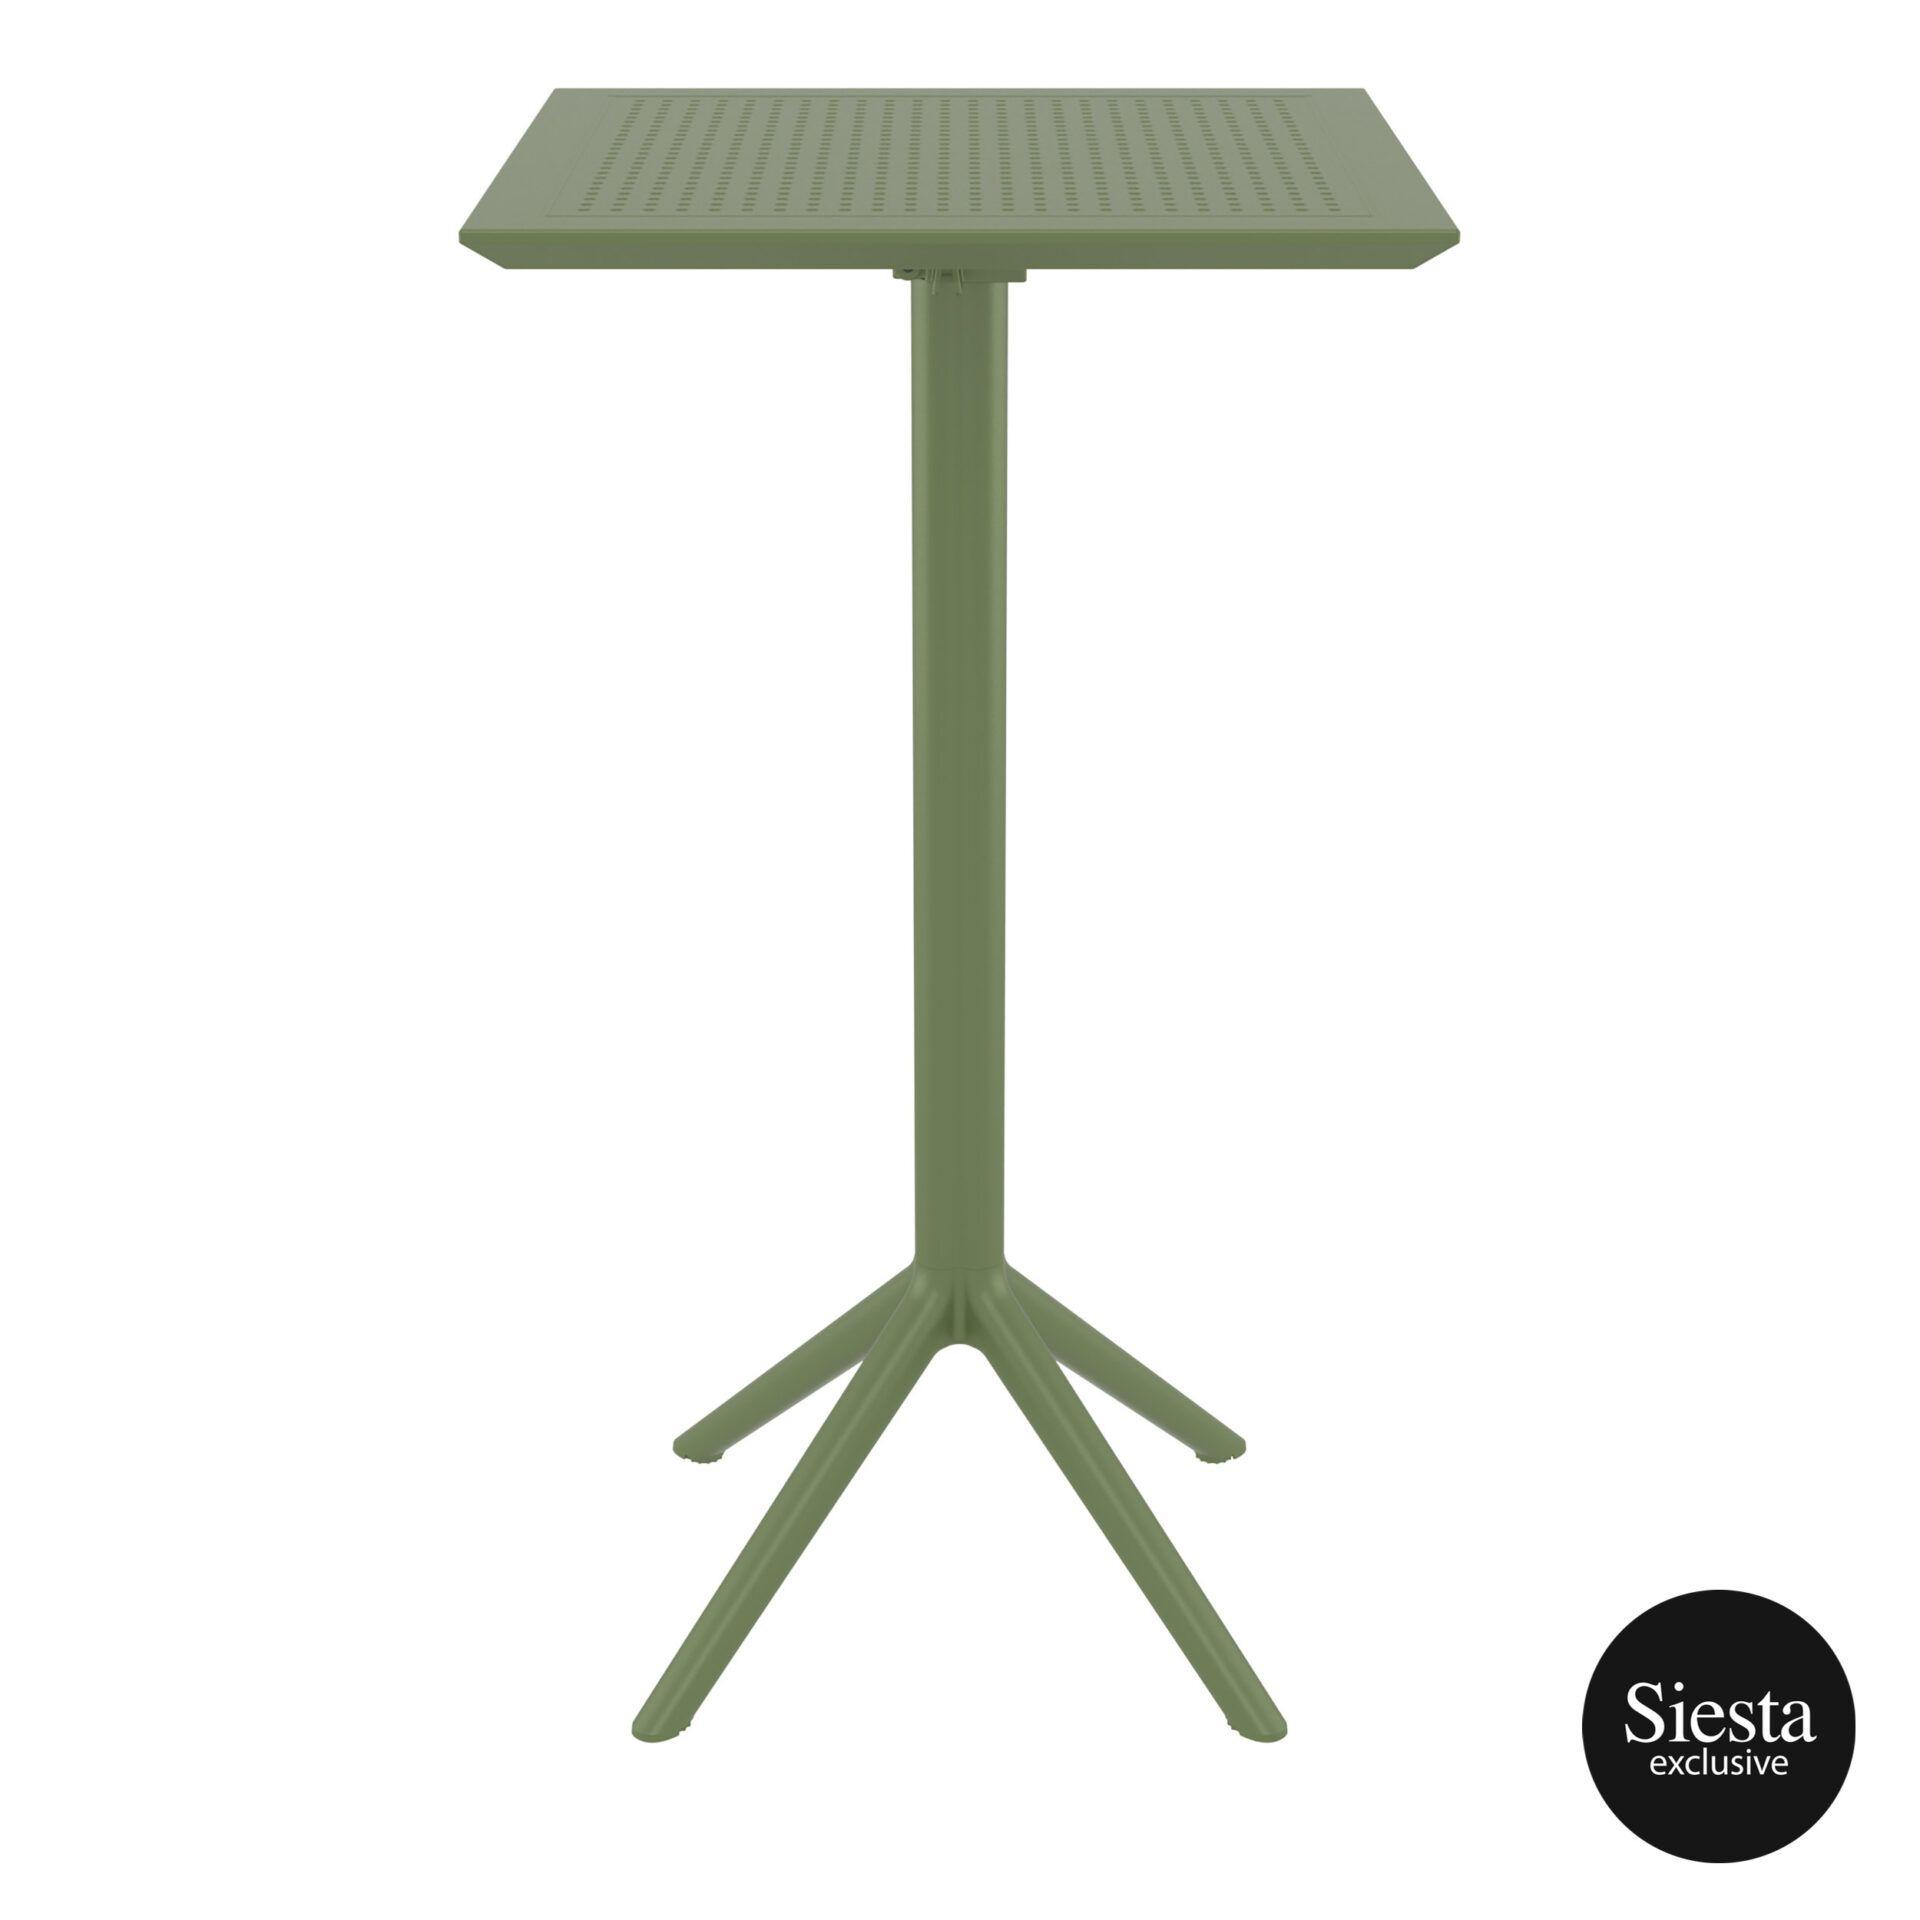 polypropylene outdoor sky folding bar table 60 olive green front 2